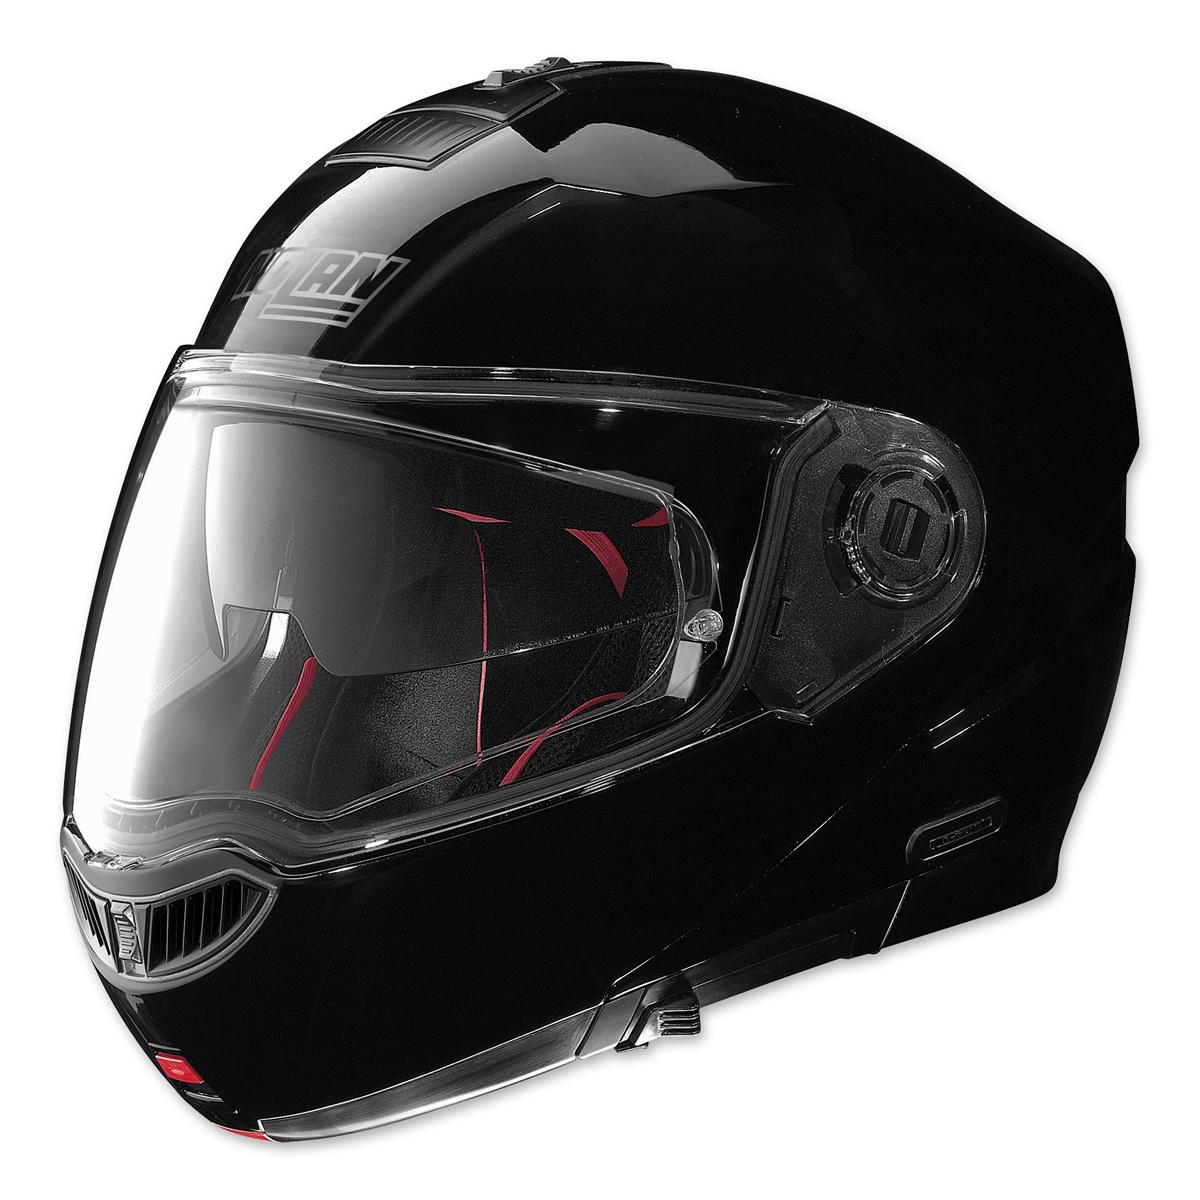 nolan n104 absolute gloss black full face helmet 914 035 j p cycles. Black Bedroom Furniture Sets. Home Design Ideas